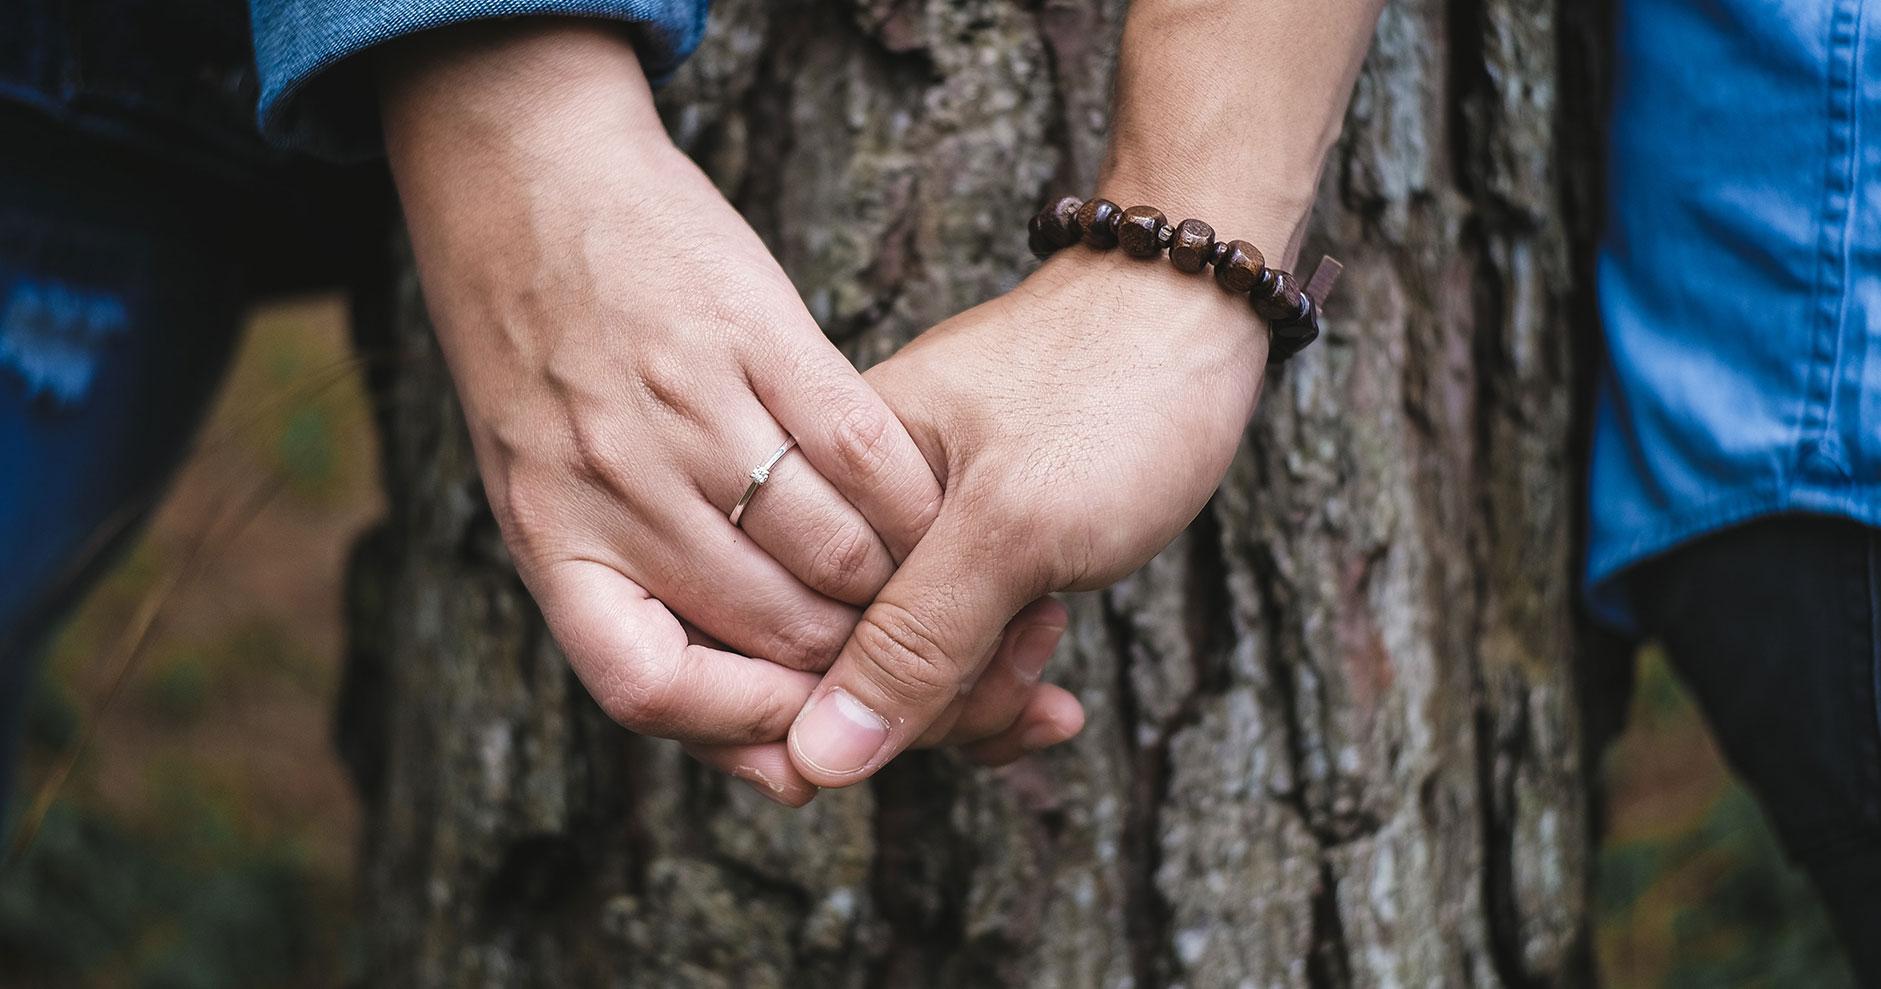 Ehe Behinderung belastet